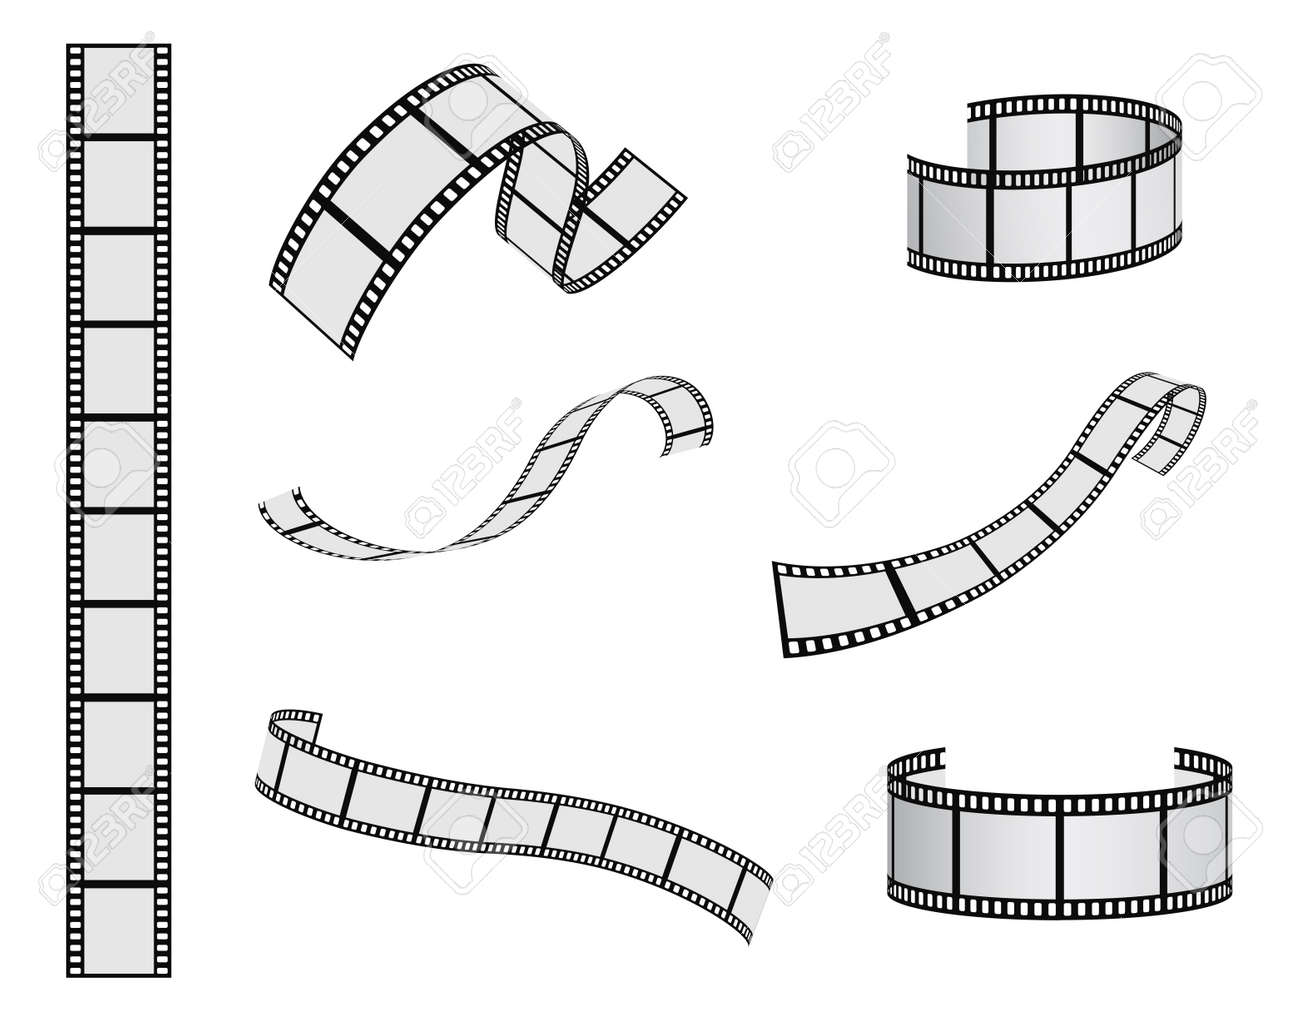 film reel vector set royalty free cliparts vectors and stock rh 123rf com film reel vector icon film reel vector graphic